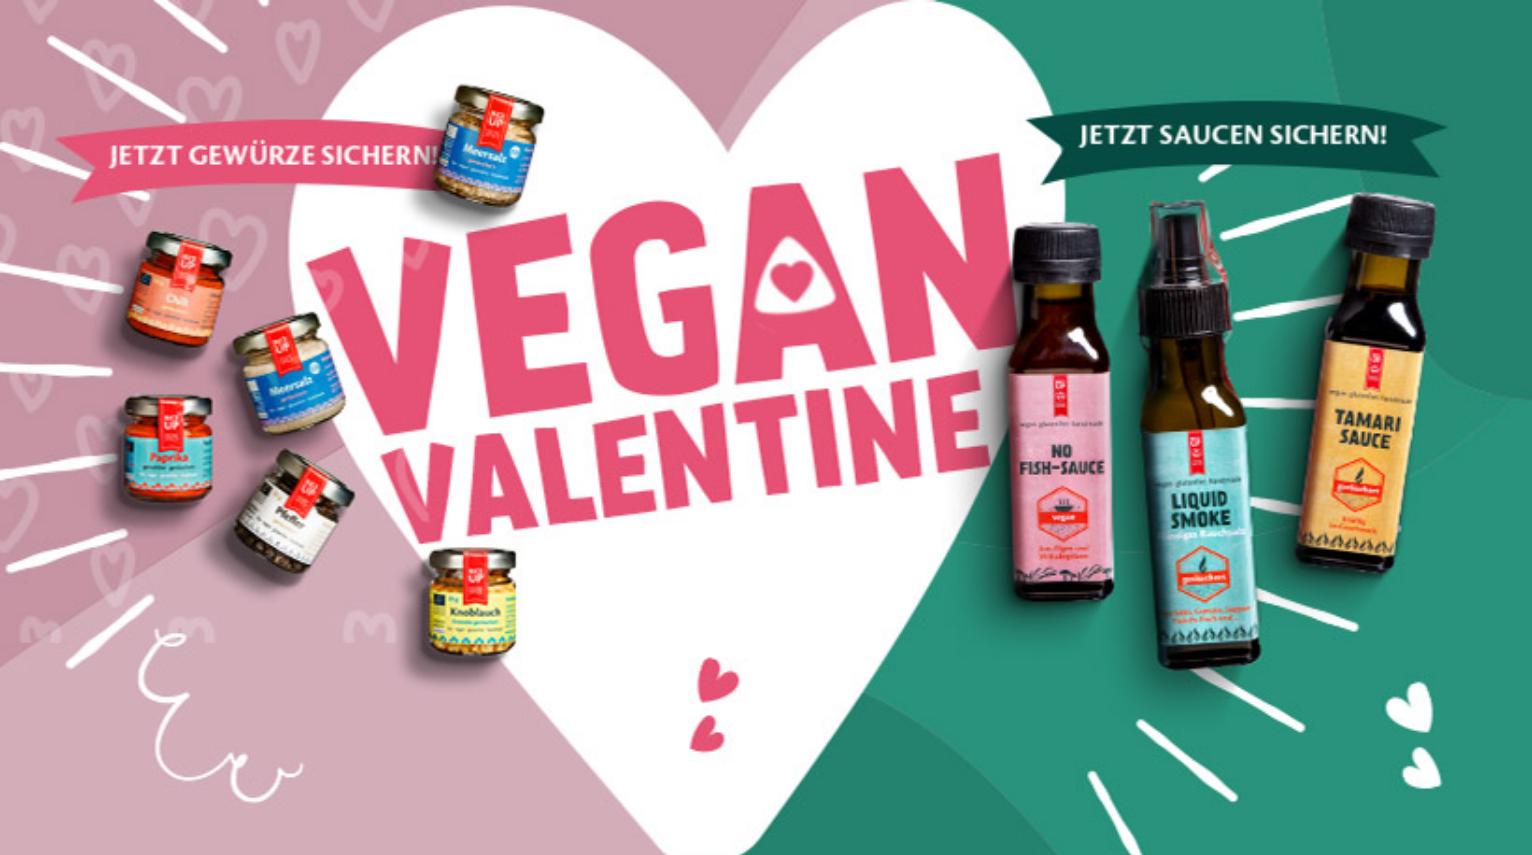 Vegan Valentine RiCEUp